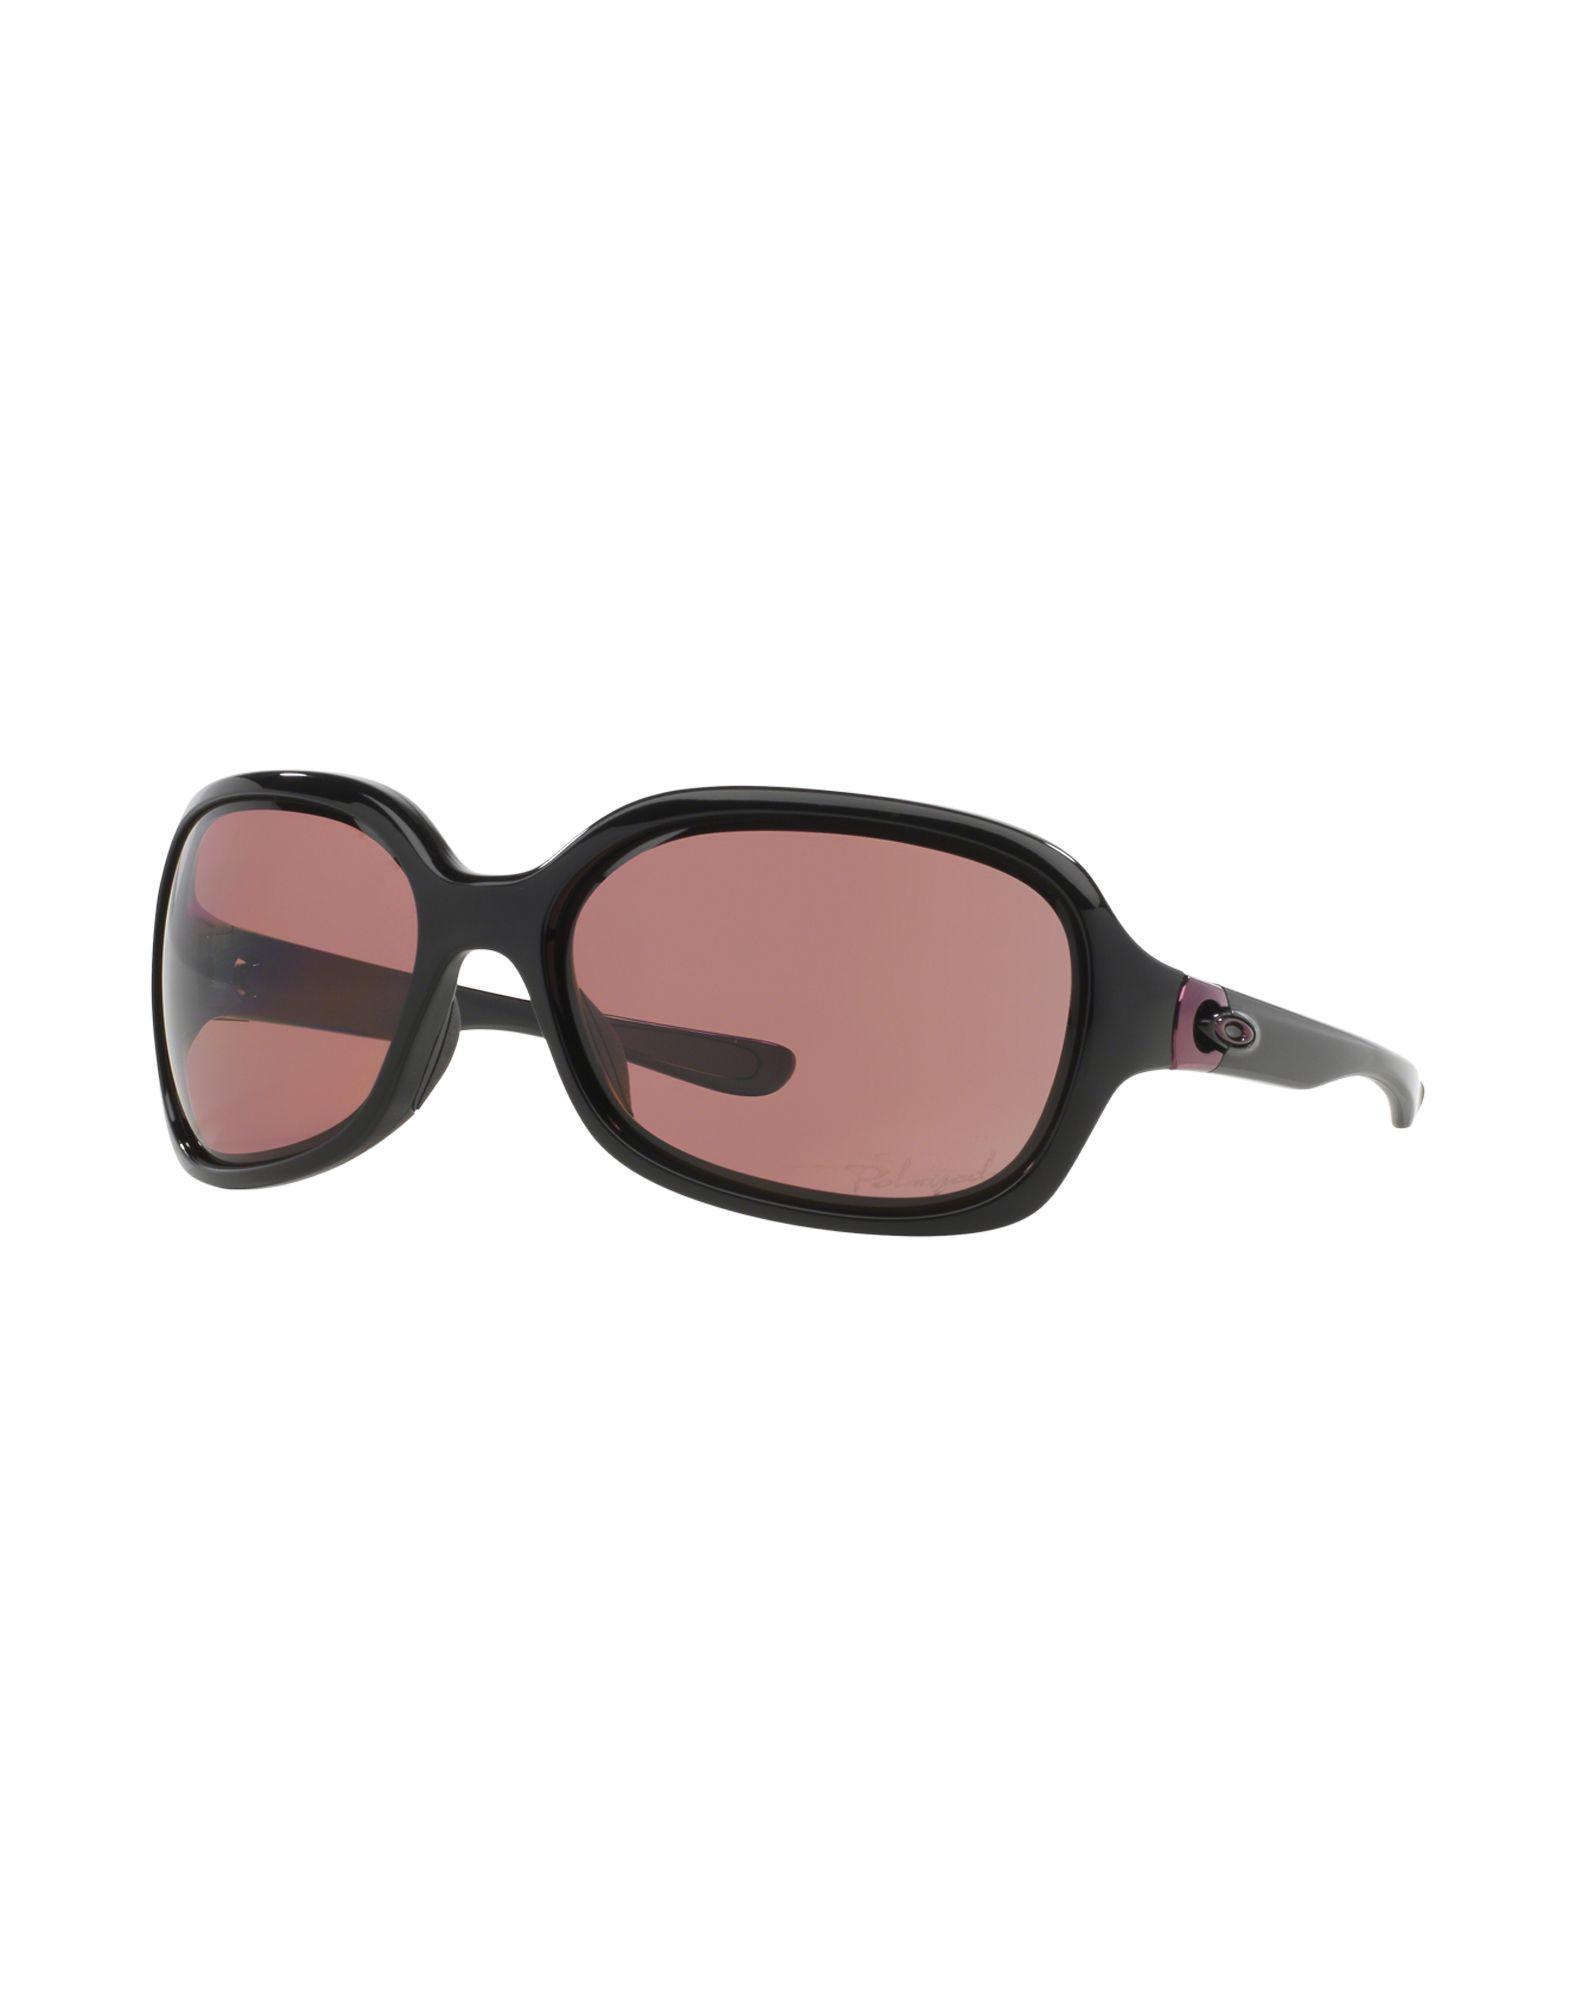 3d2480570c3 Womens Oakley Sunglasses Ebay